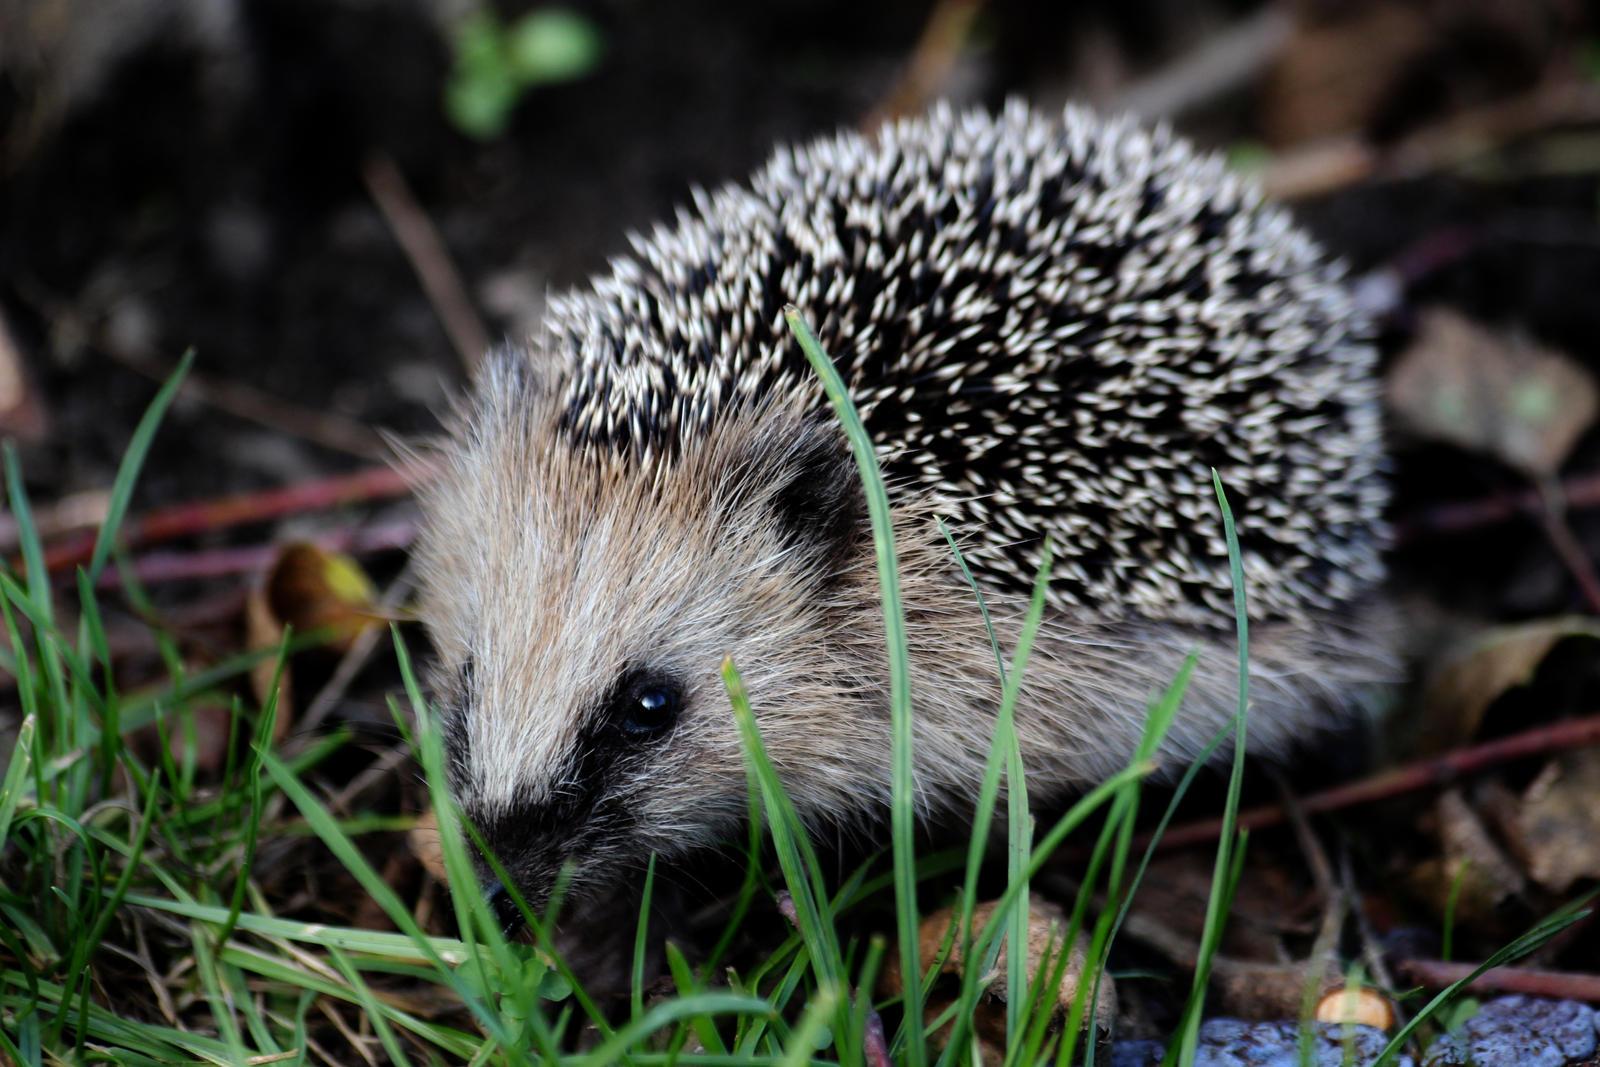 Hedgehog by wuestenbrand